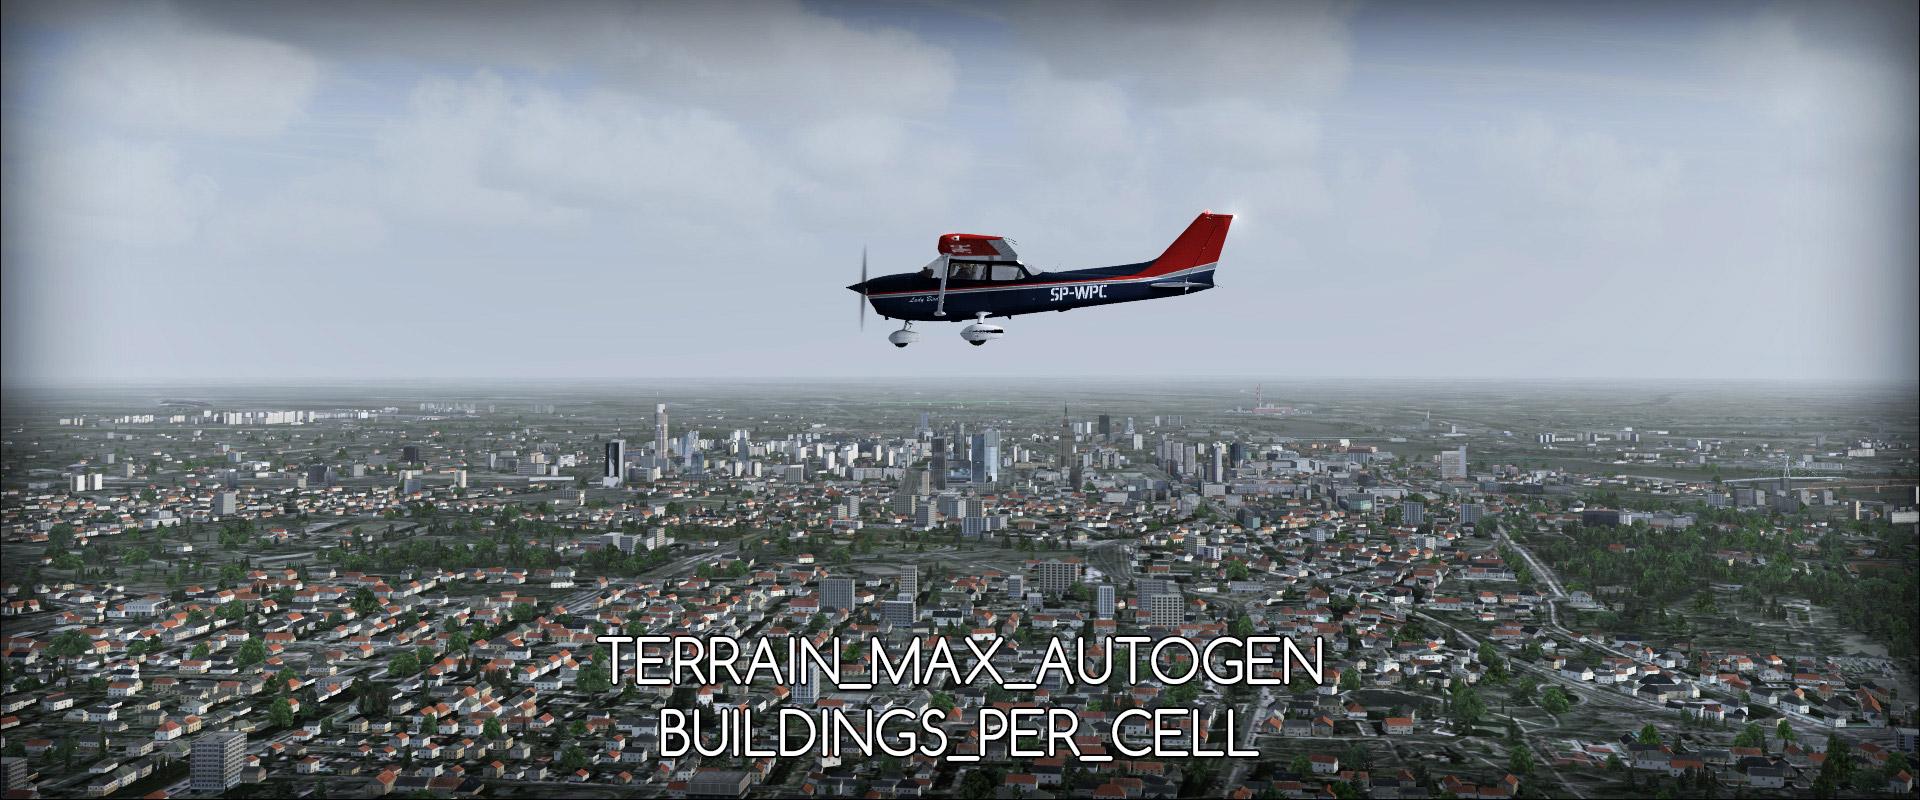 TERRAIN_MAX_AUTOGEN_BUILDINGS_PER_CELL